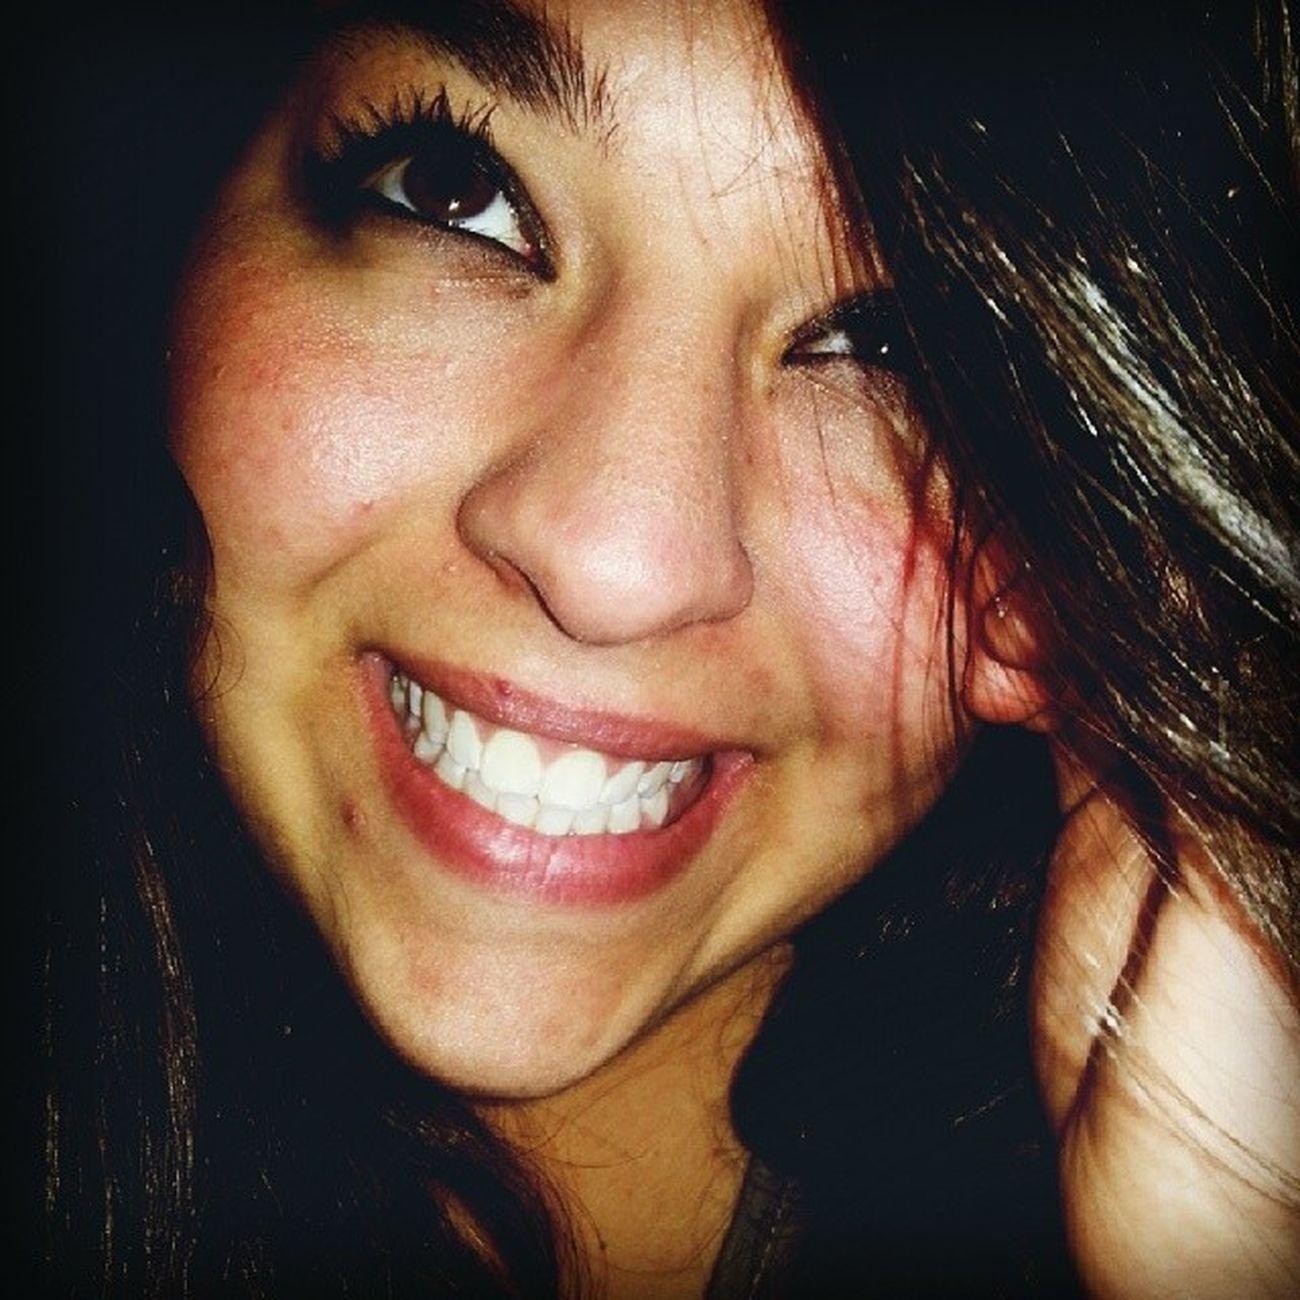 E scattare una foto mentre il mio sguardo si perde nel tuo.. ❤ Instagram Love Eyesiandeyes Happy smile happines love eyes italy mylove heart sguardo amour paris sguardoalto jetaime instafollow instalove live life instagood today meandyou forever infinitylove ❤